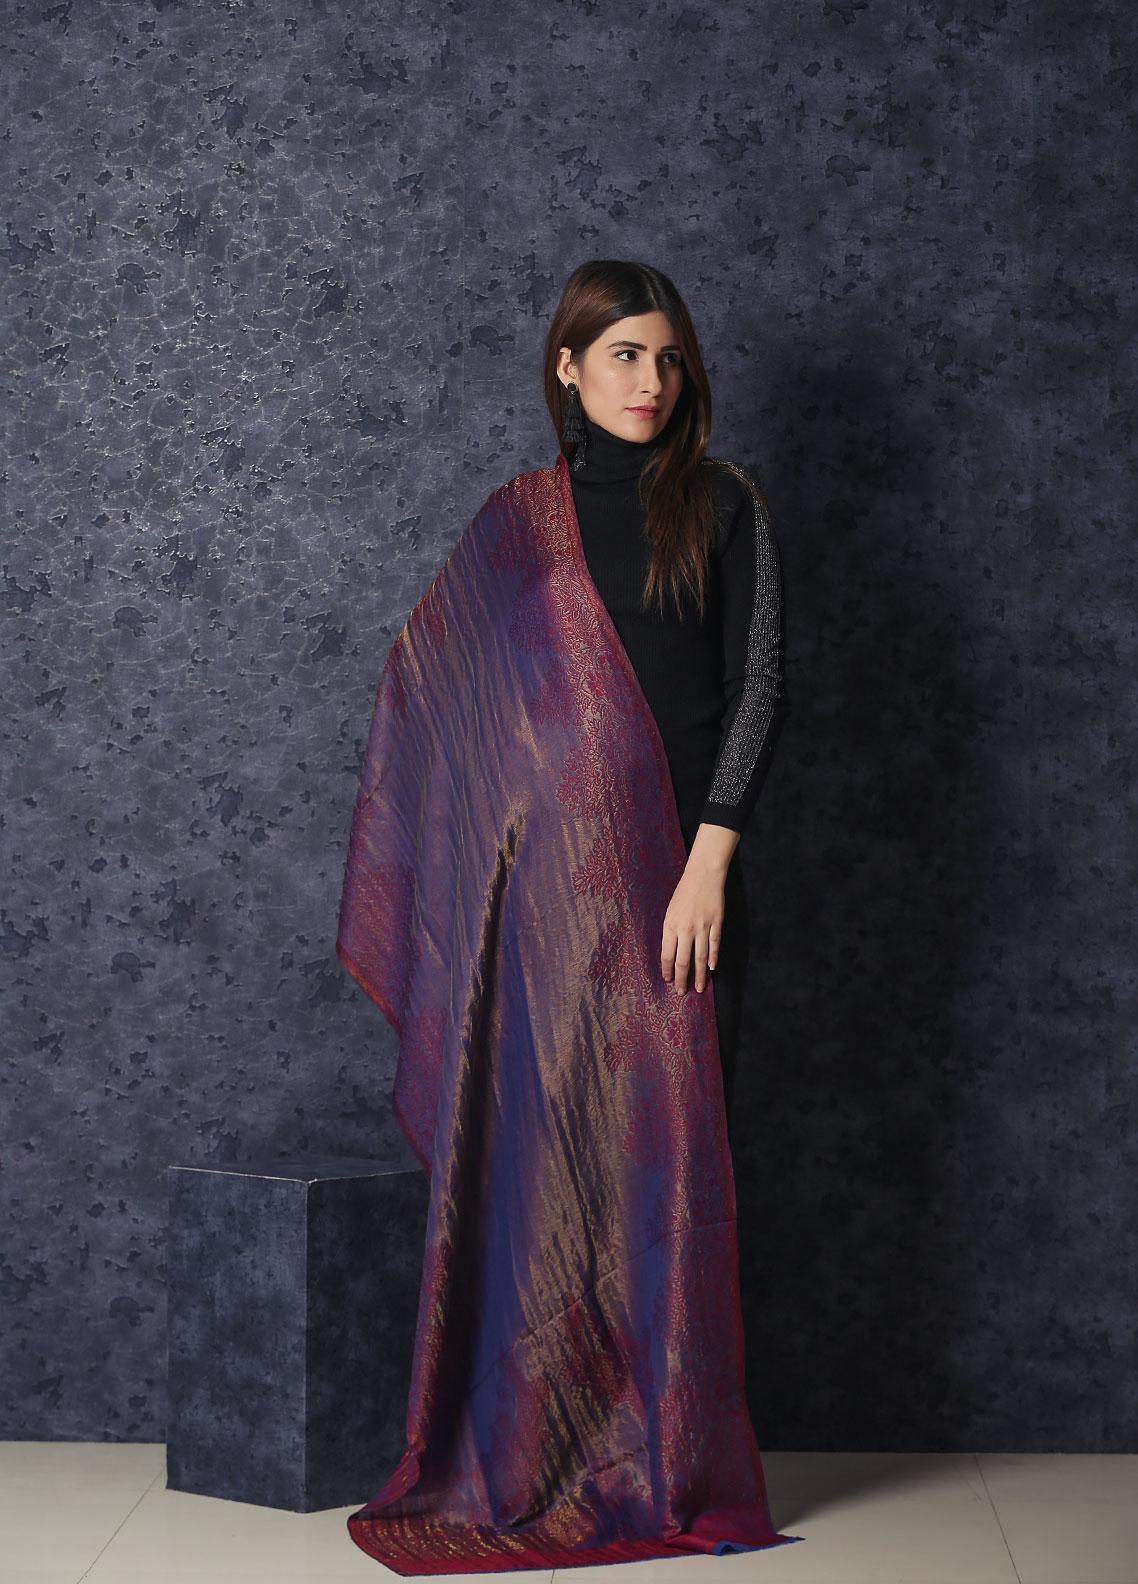 Sanaulla Exclusive Range Embroidered Pashmina  Shawl MIR-25 Maroon - Kashmiri Shawls